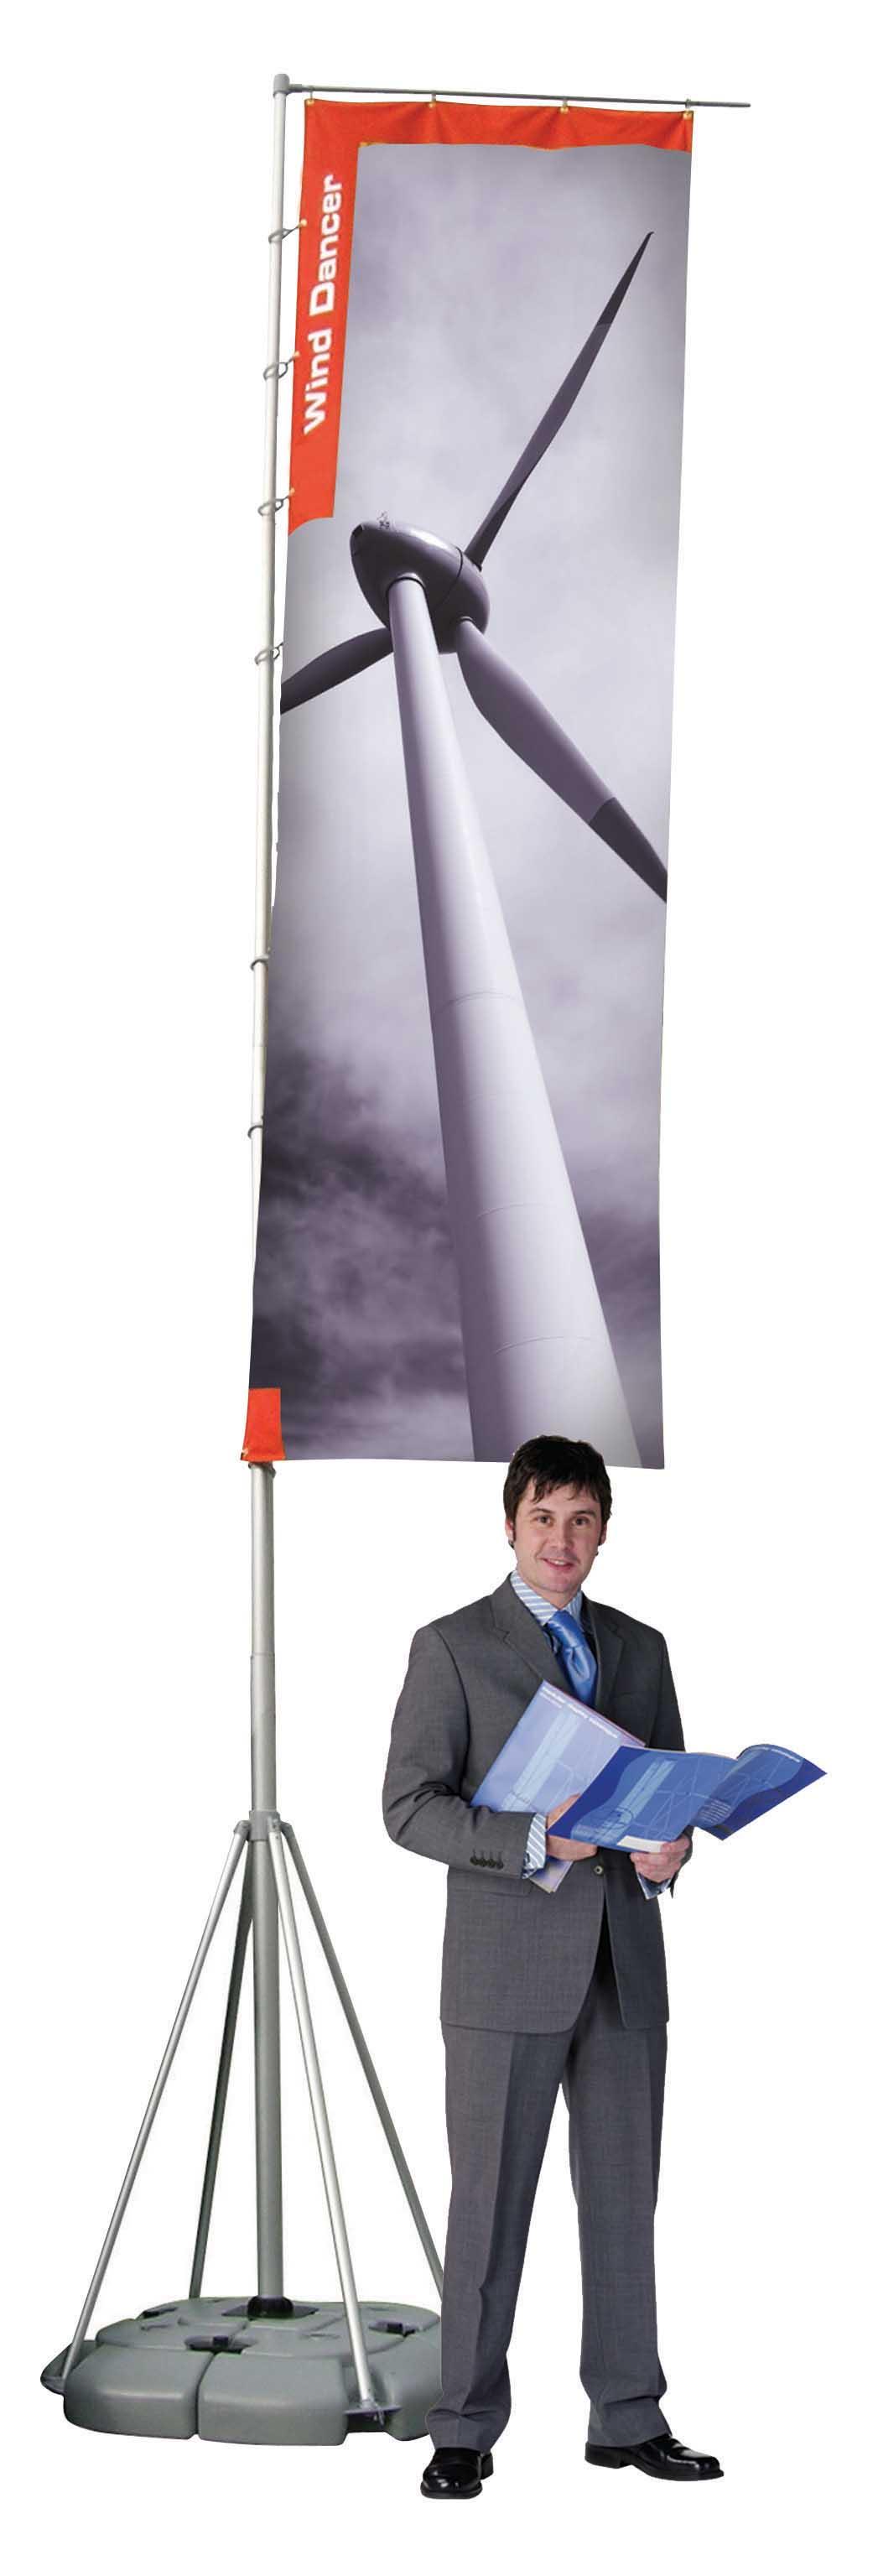 Wind  dancer  5m magas zászló tartó